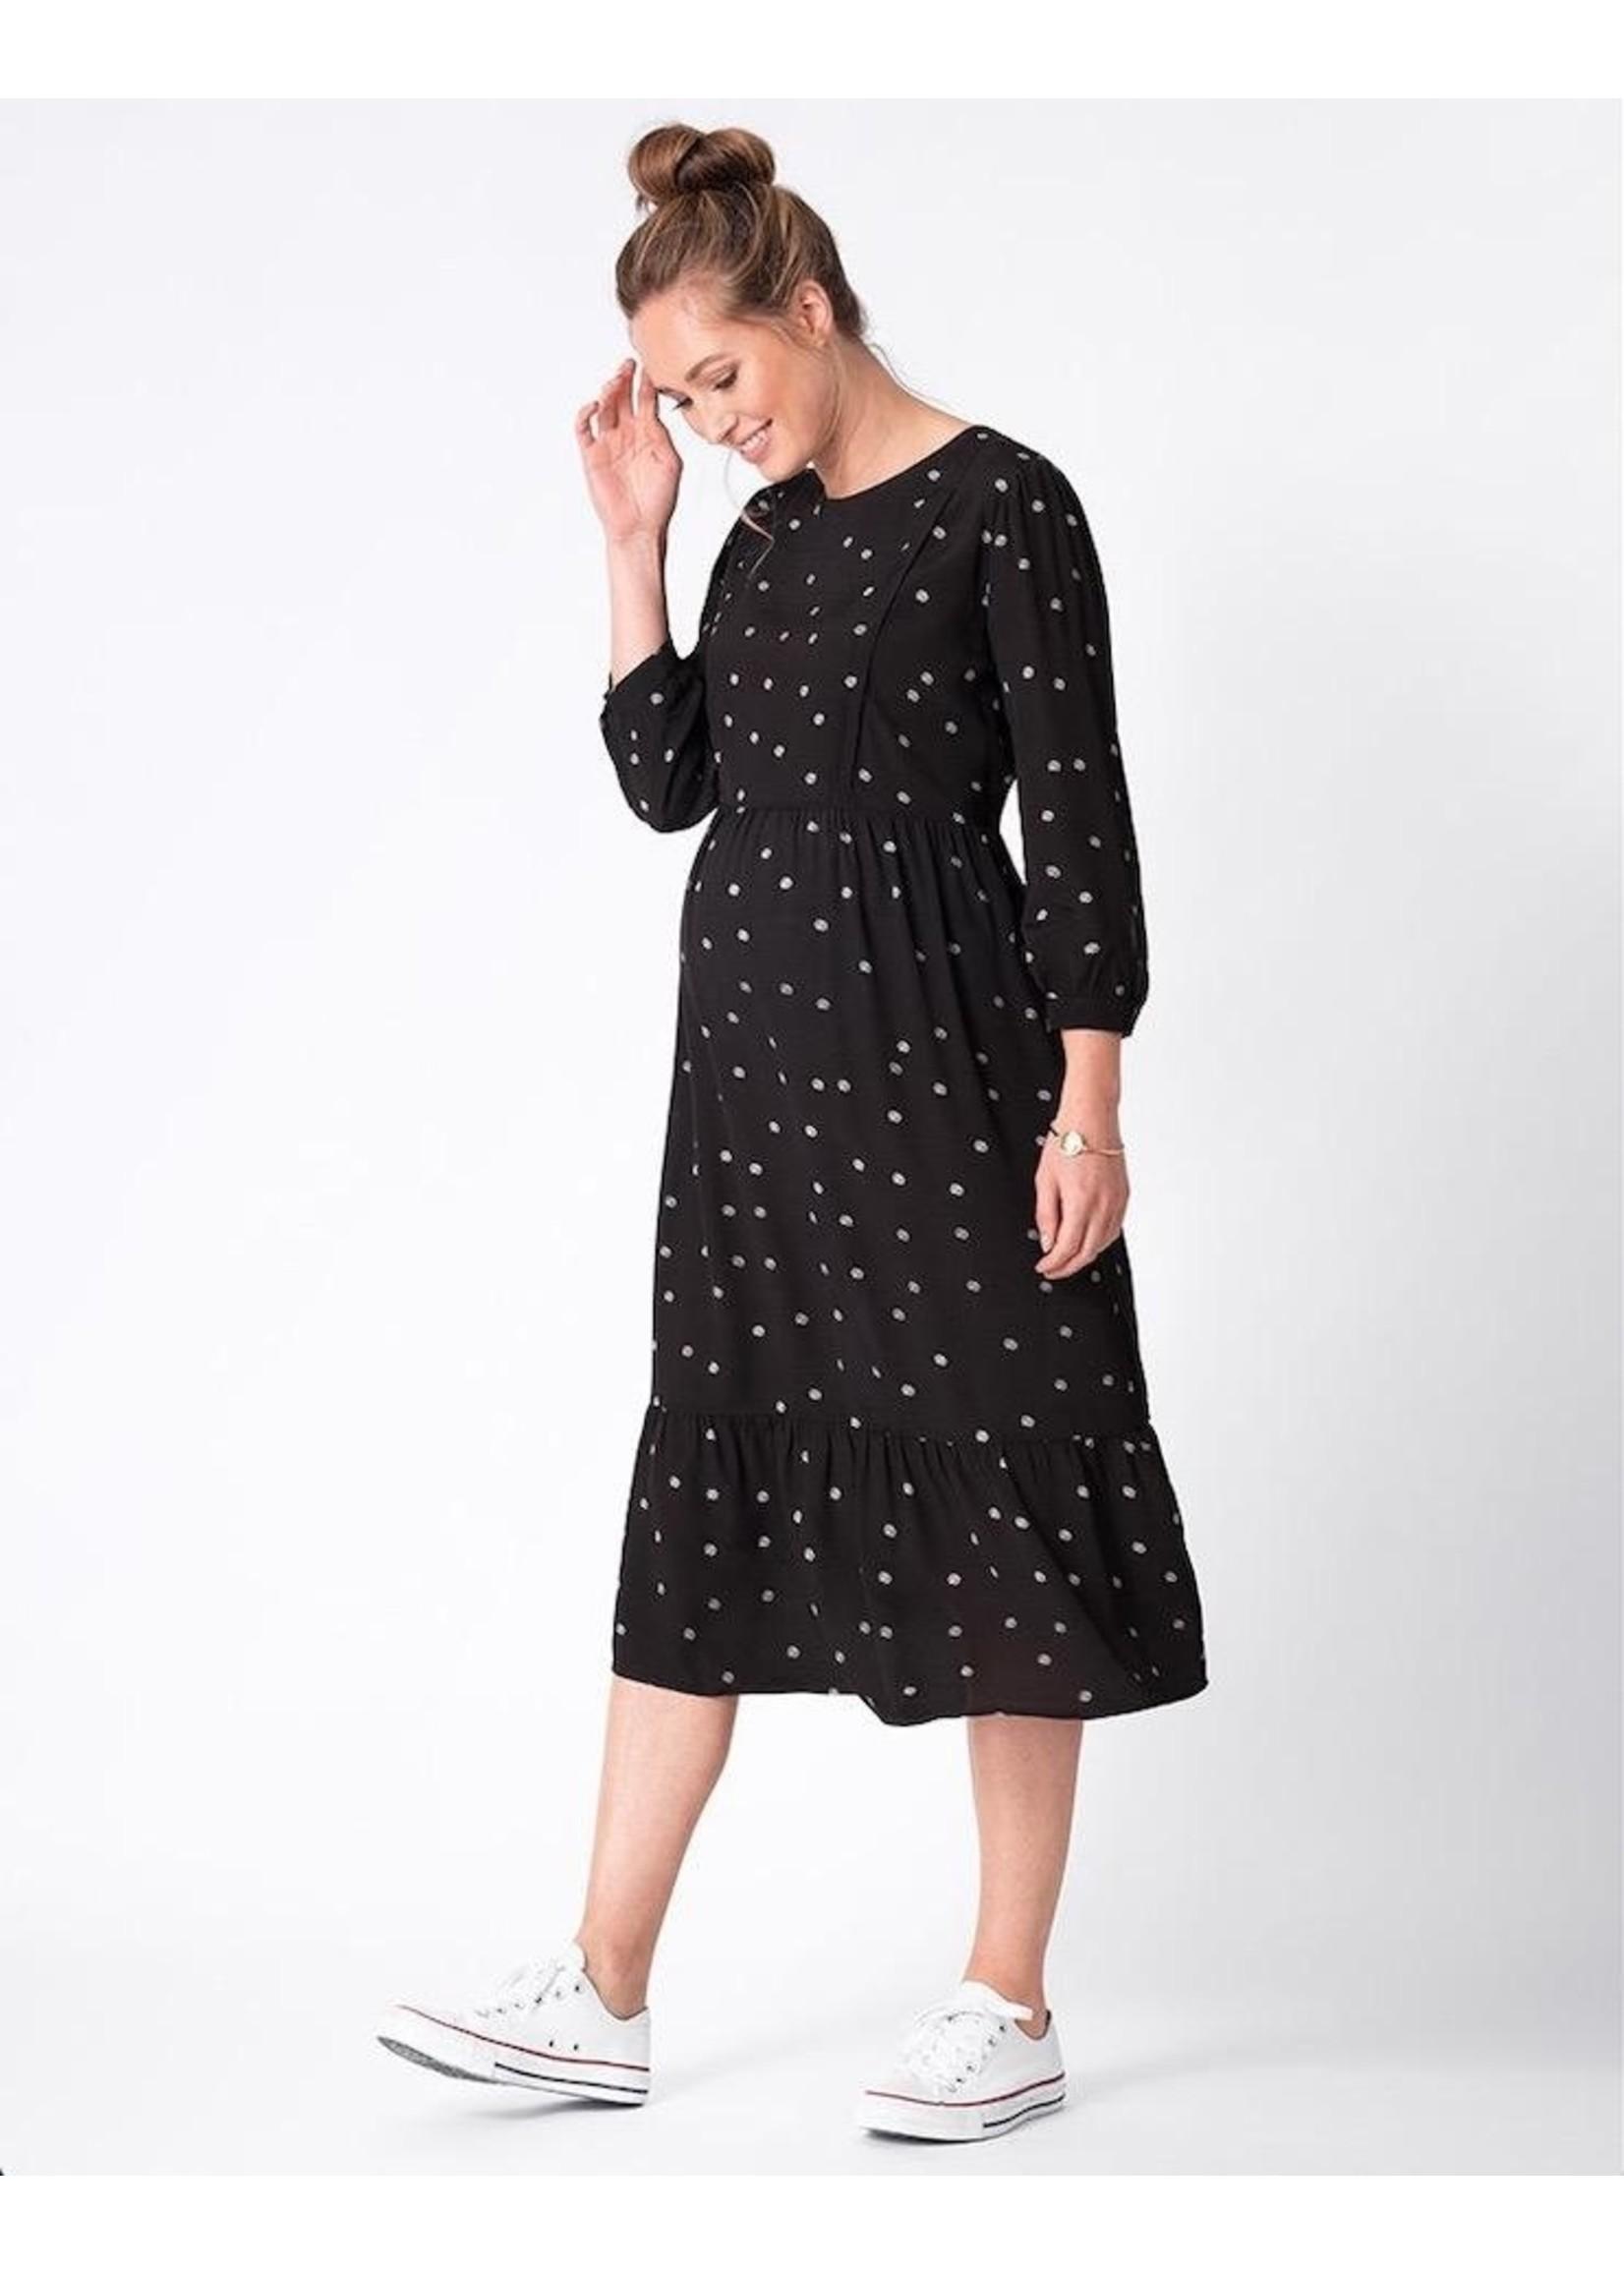 Seraphine Seraphine, Sorina Black Dot Maternity & Nursing Midi Dress